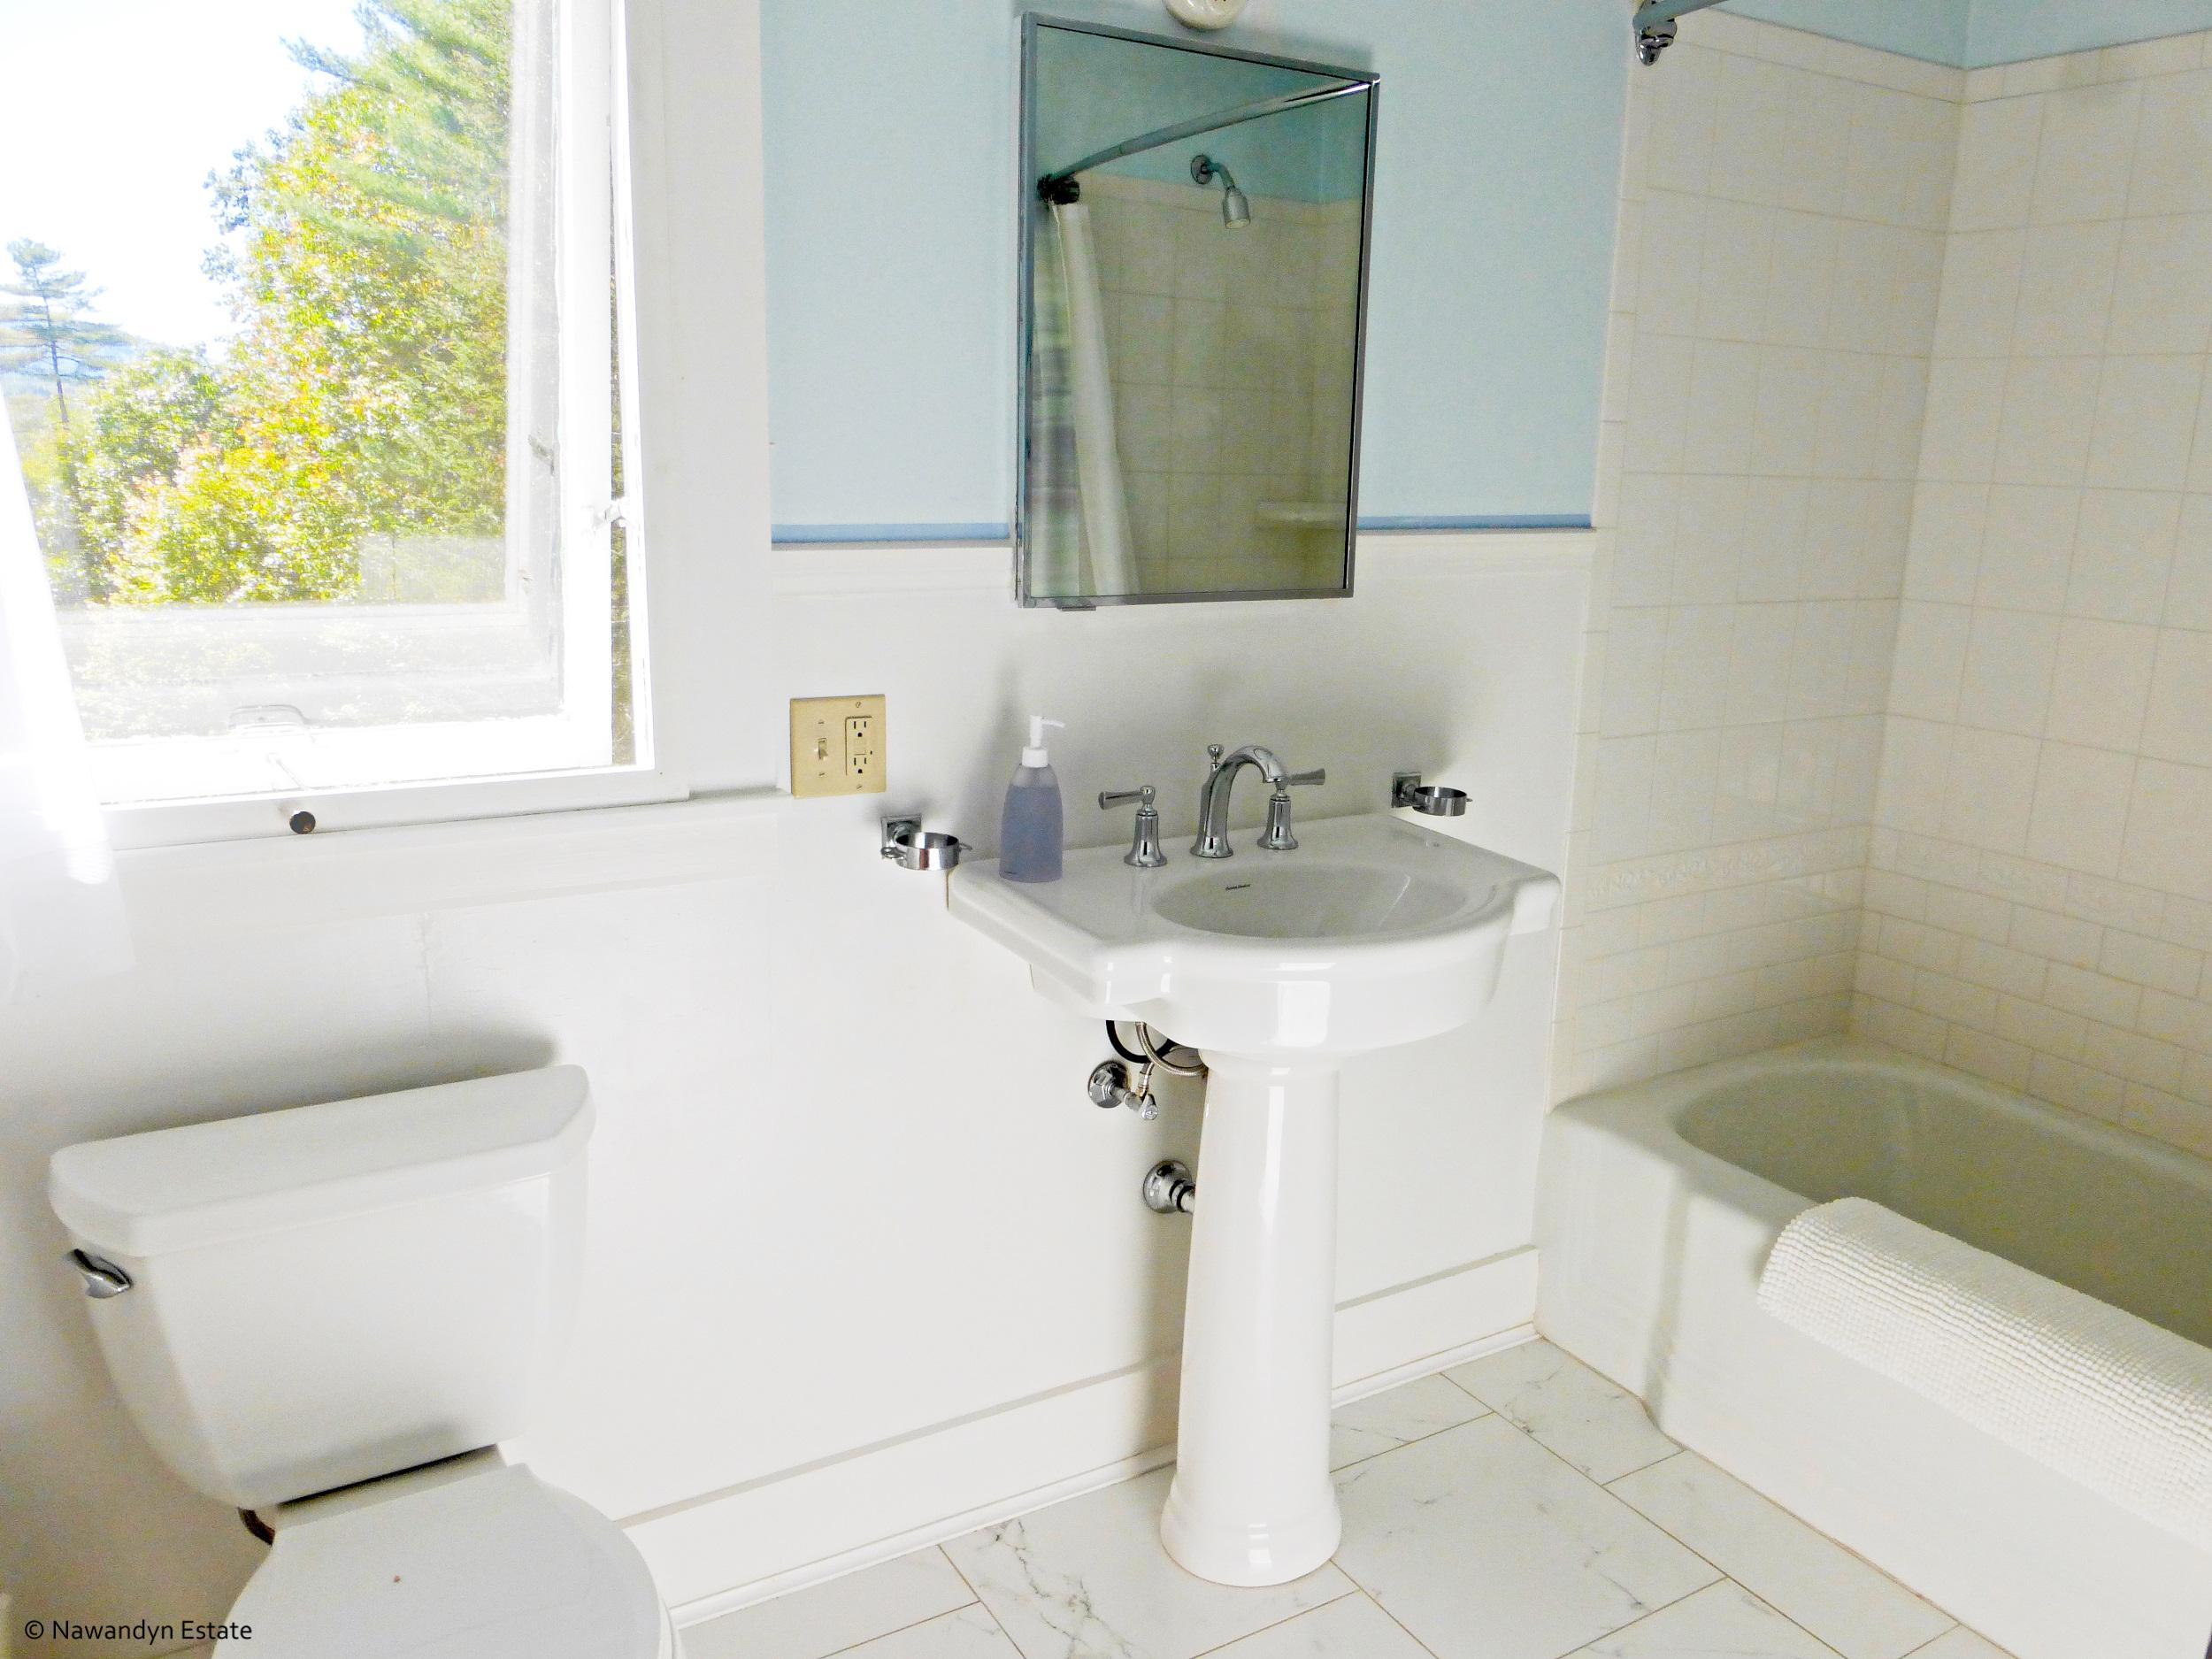 1 of 3 Full Bathrooms